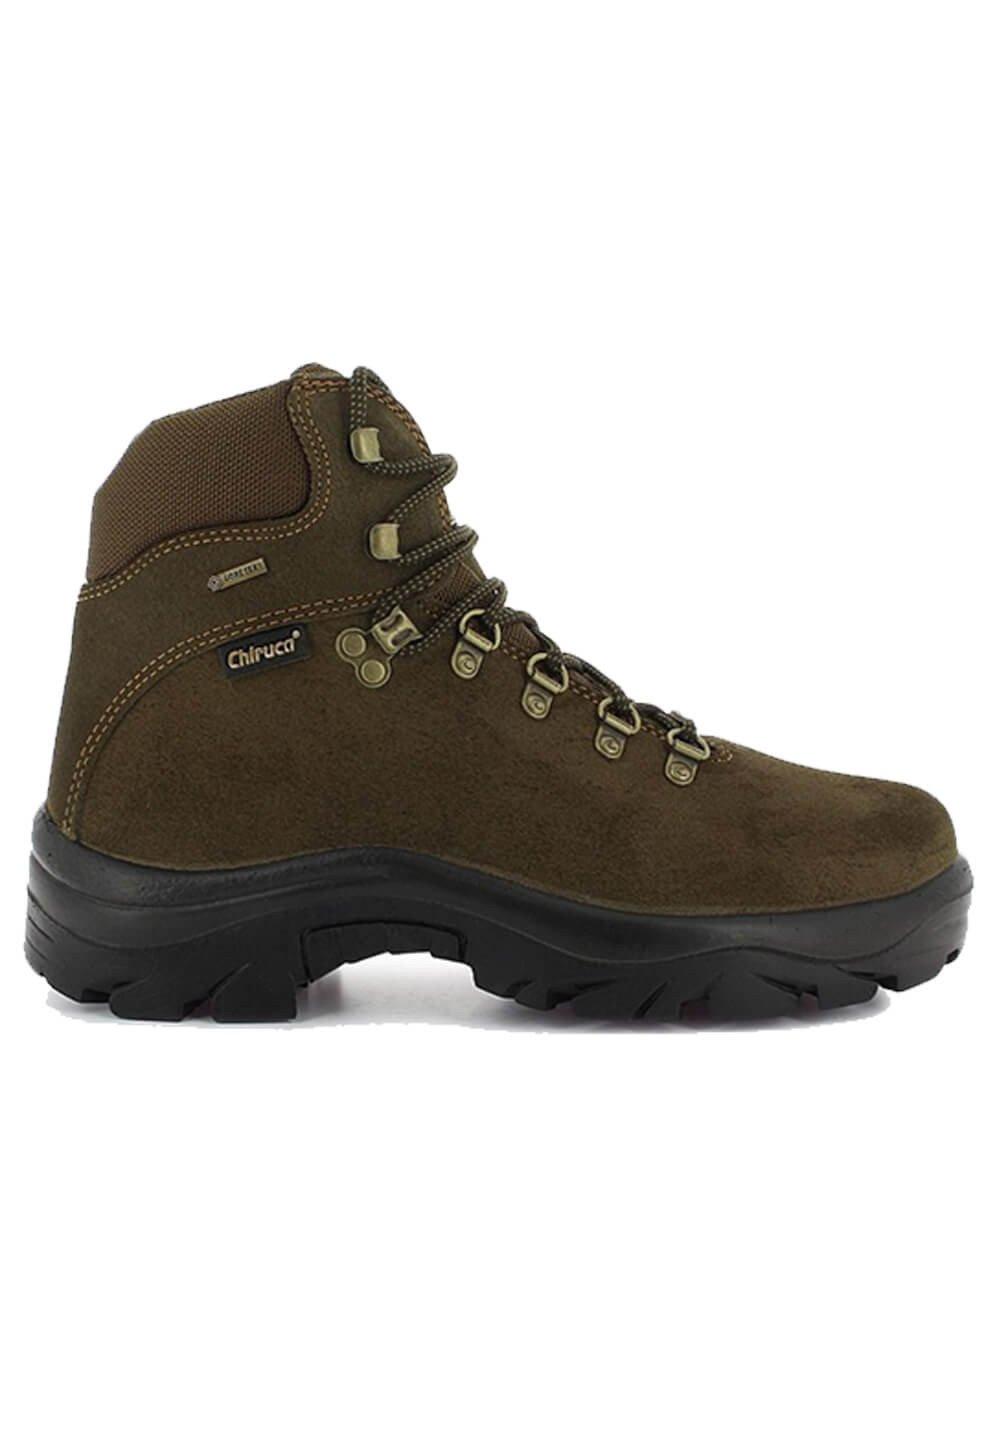 Botas Chiruca Pointer 01 46 EU Verde Venta de calzado deportivo de moda en línea